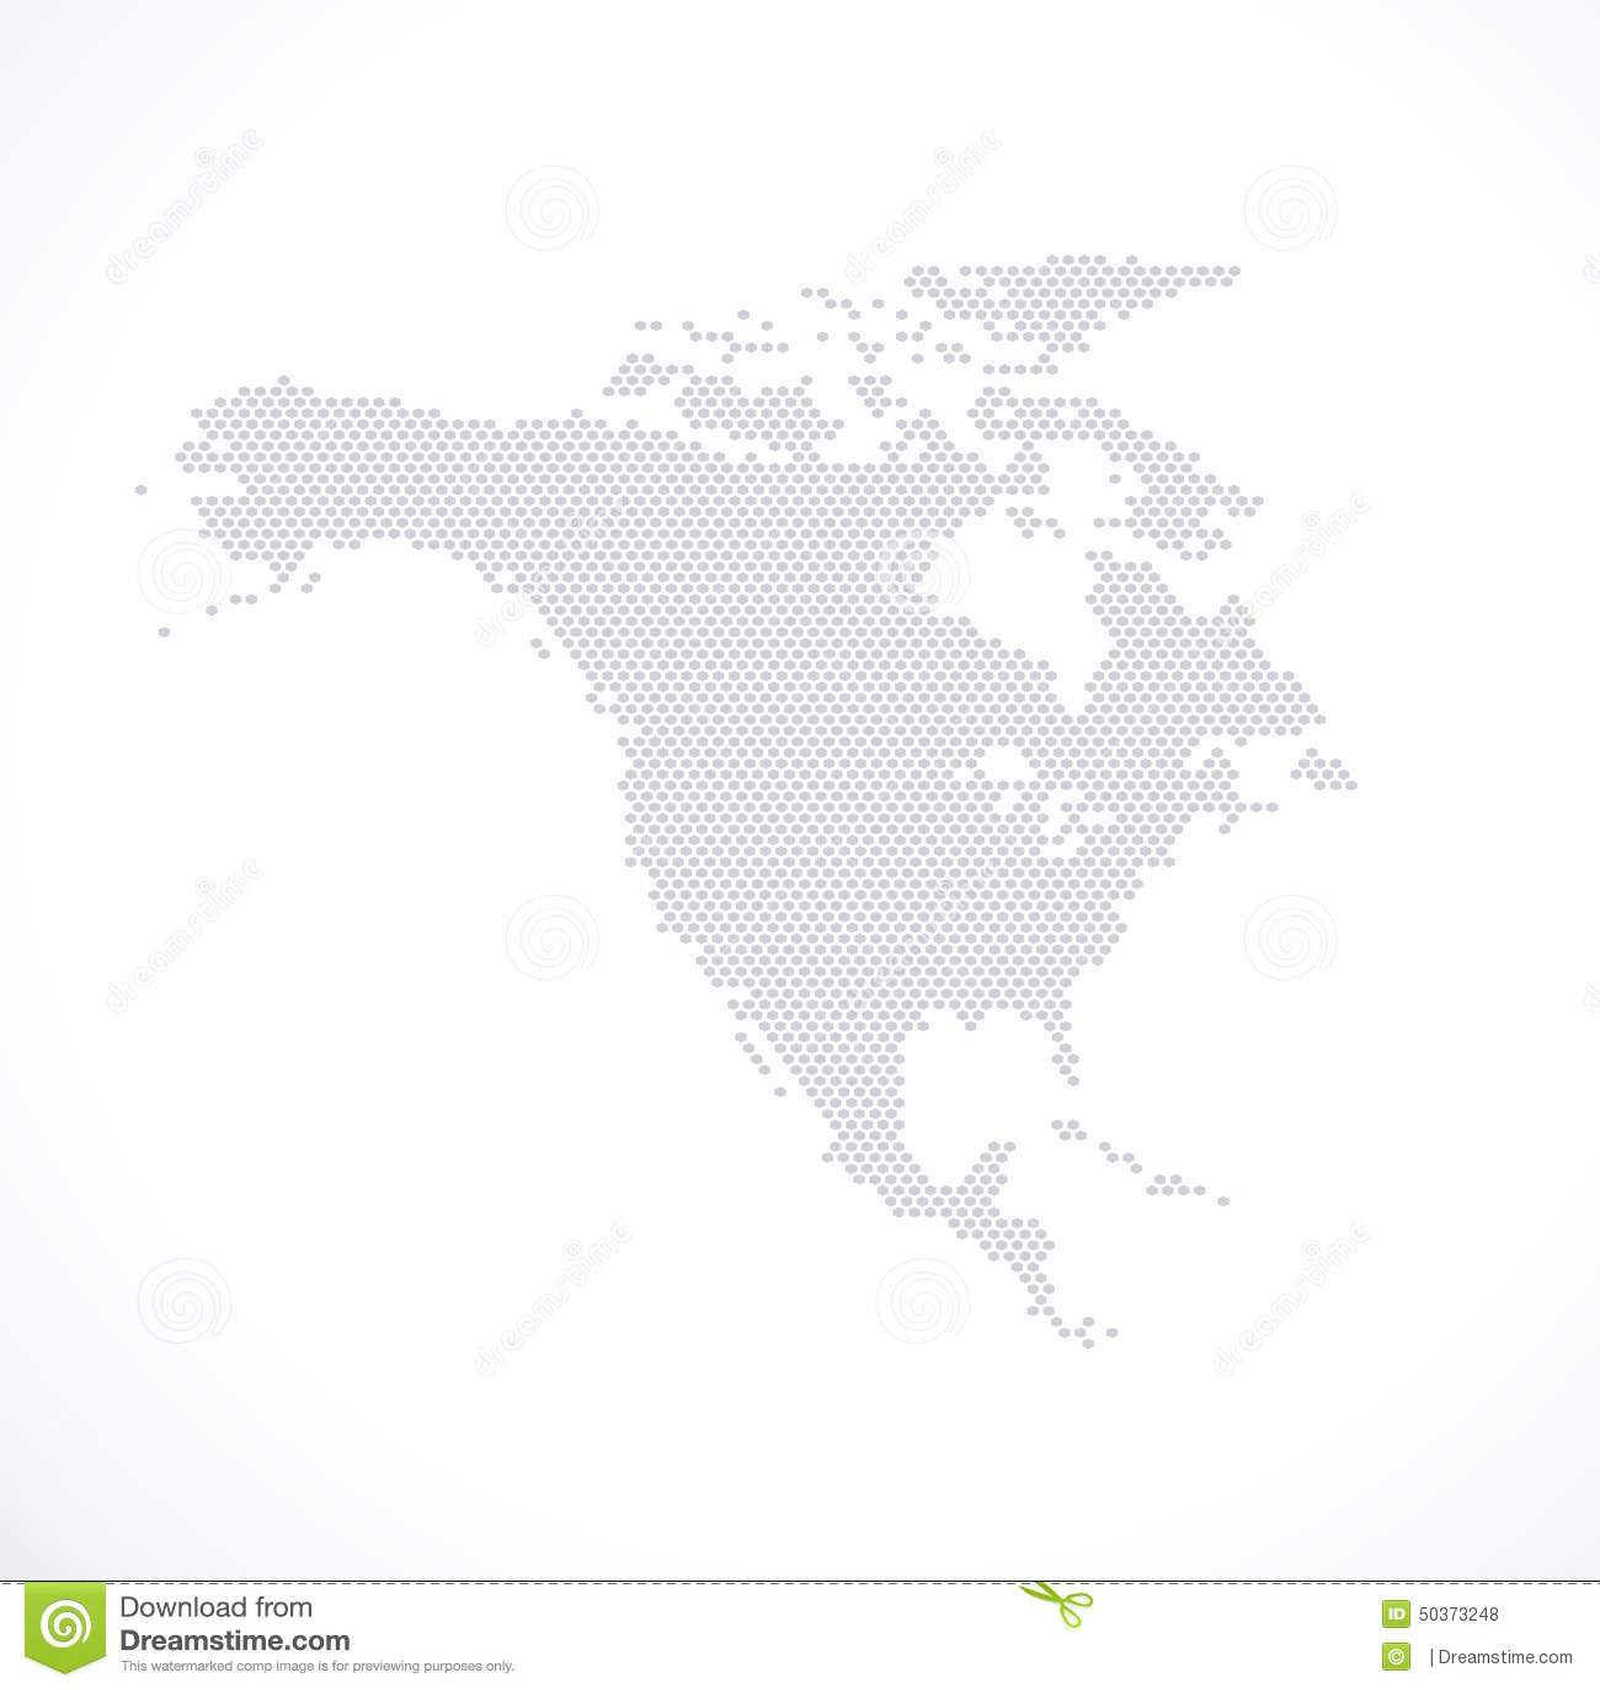 North America Map Hexagon Vector Illustration Stock Illustration - Vector map of north america